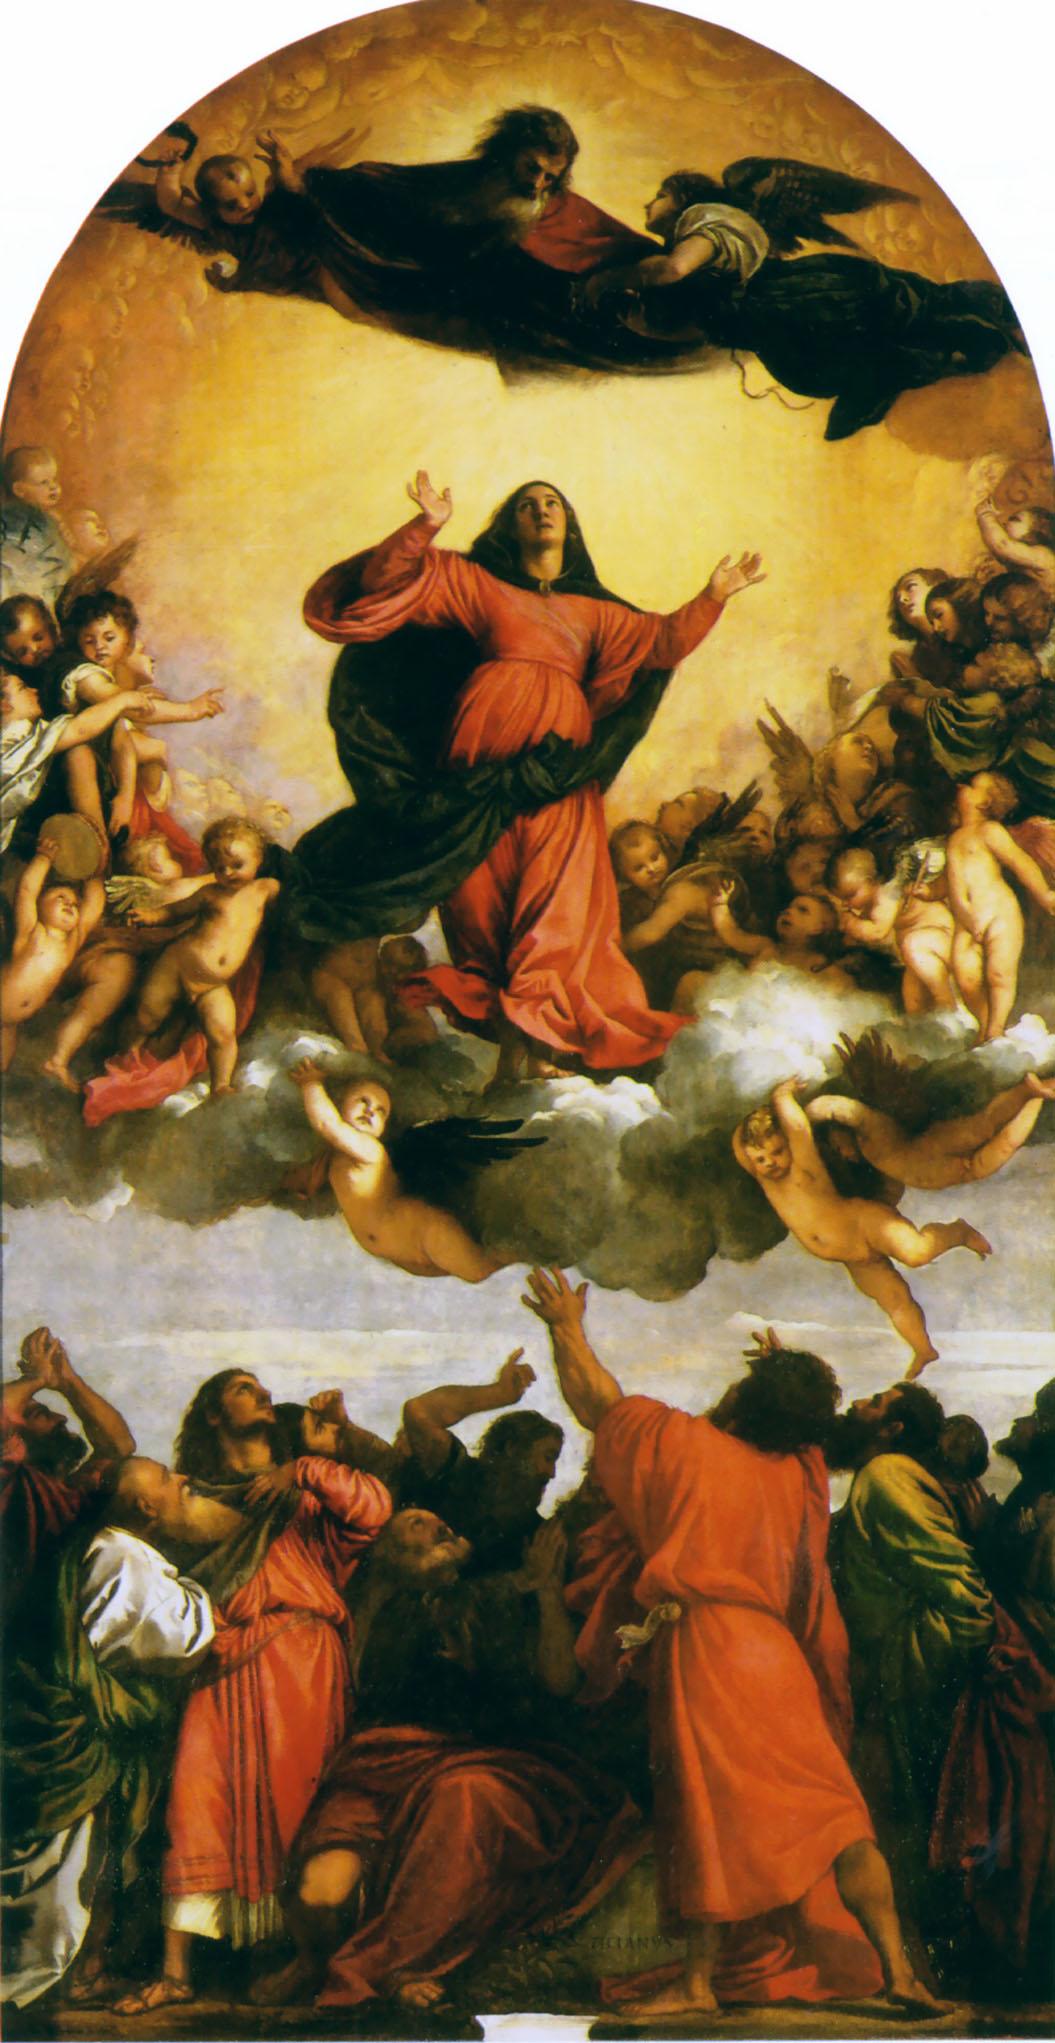 Assumption of the Virgin by Titian